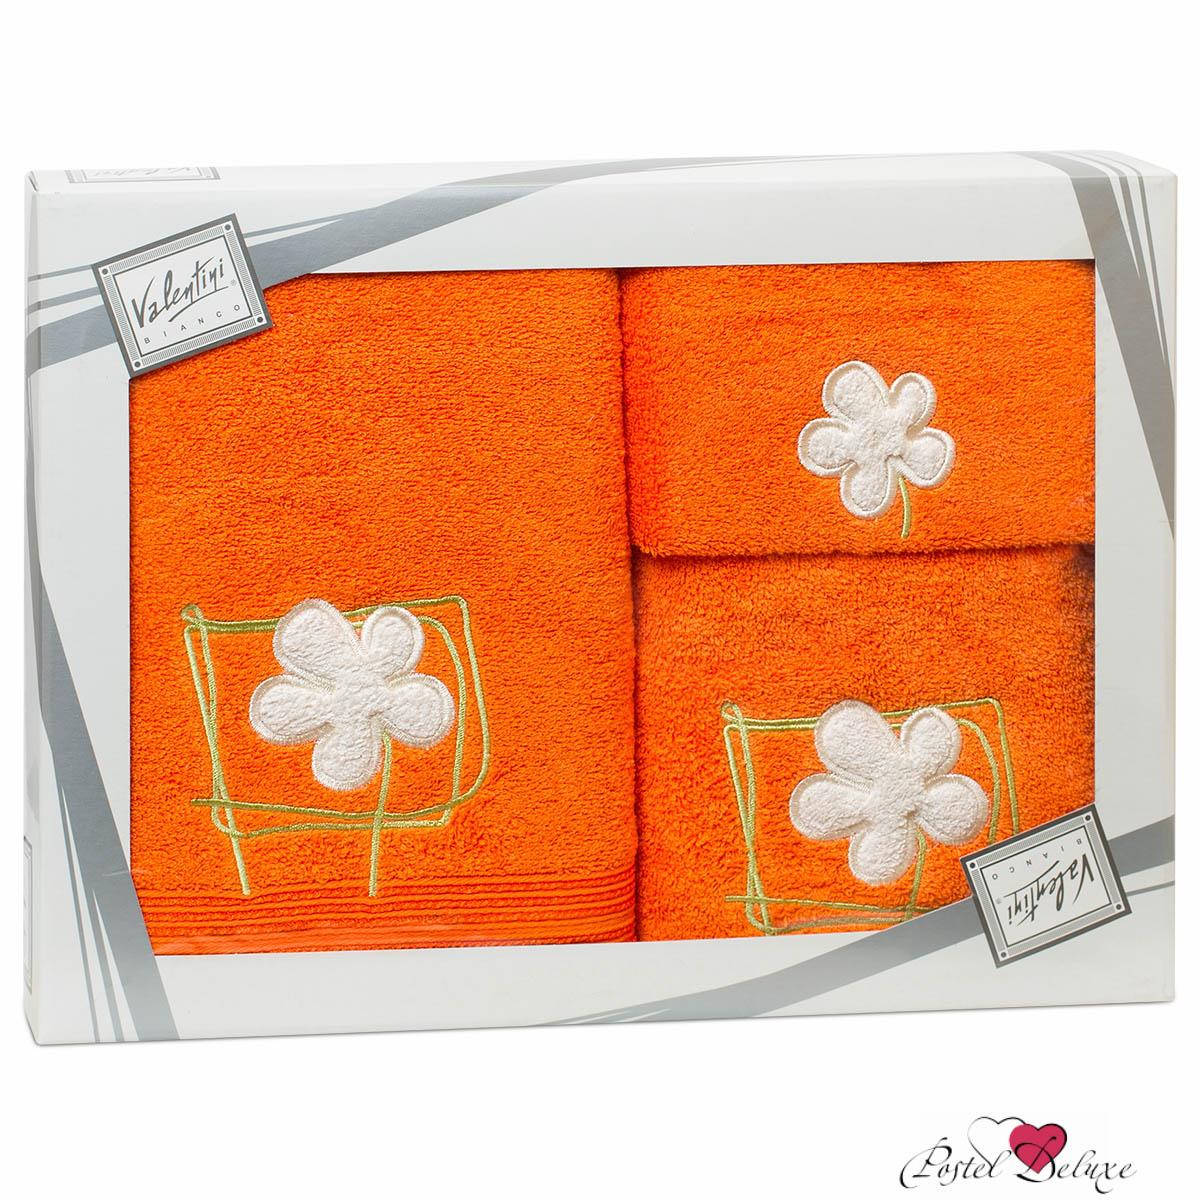 Полотенца Valentini Полотенце Flower Цвет: Оранжевый (Набор) набор из 3 полотенец merzuka sakura 50х90 2 70х140 8432 оранжевый